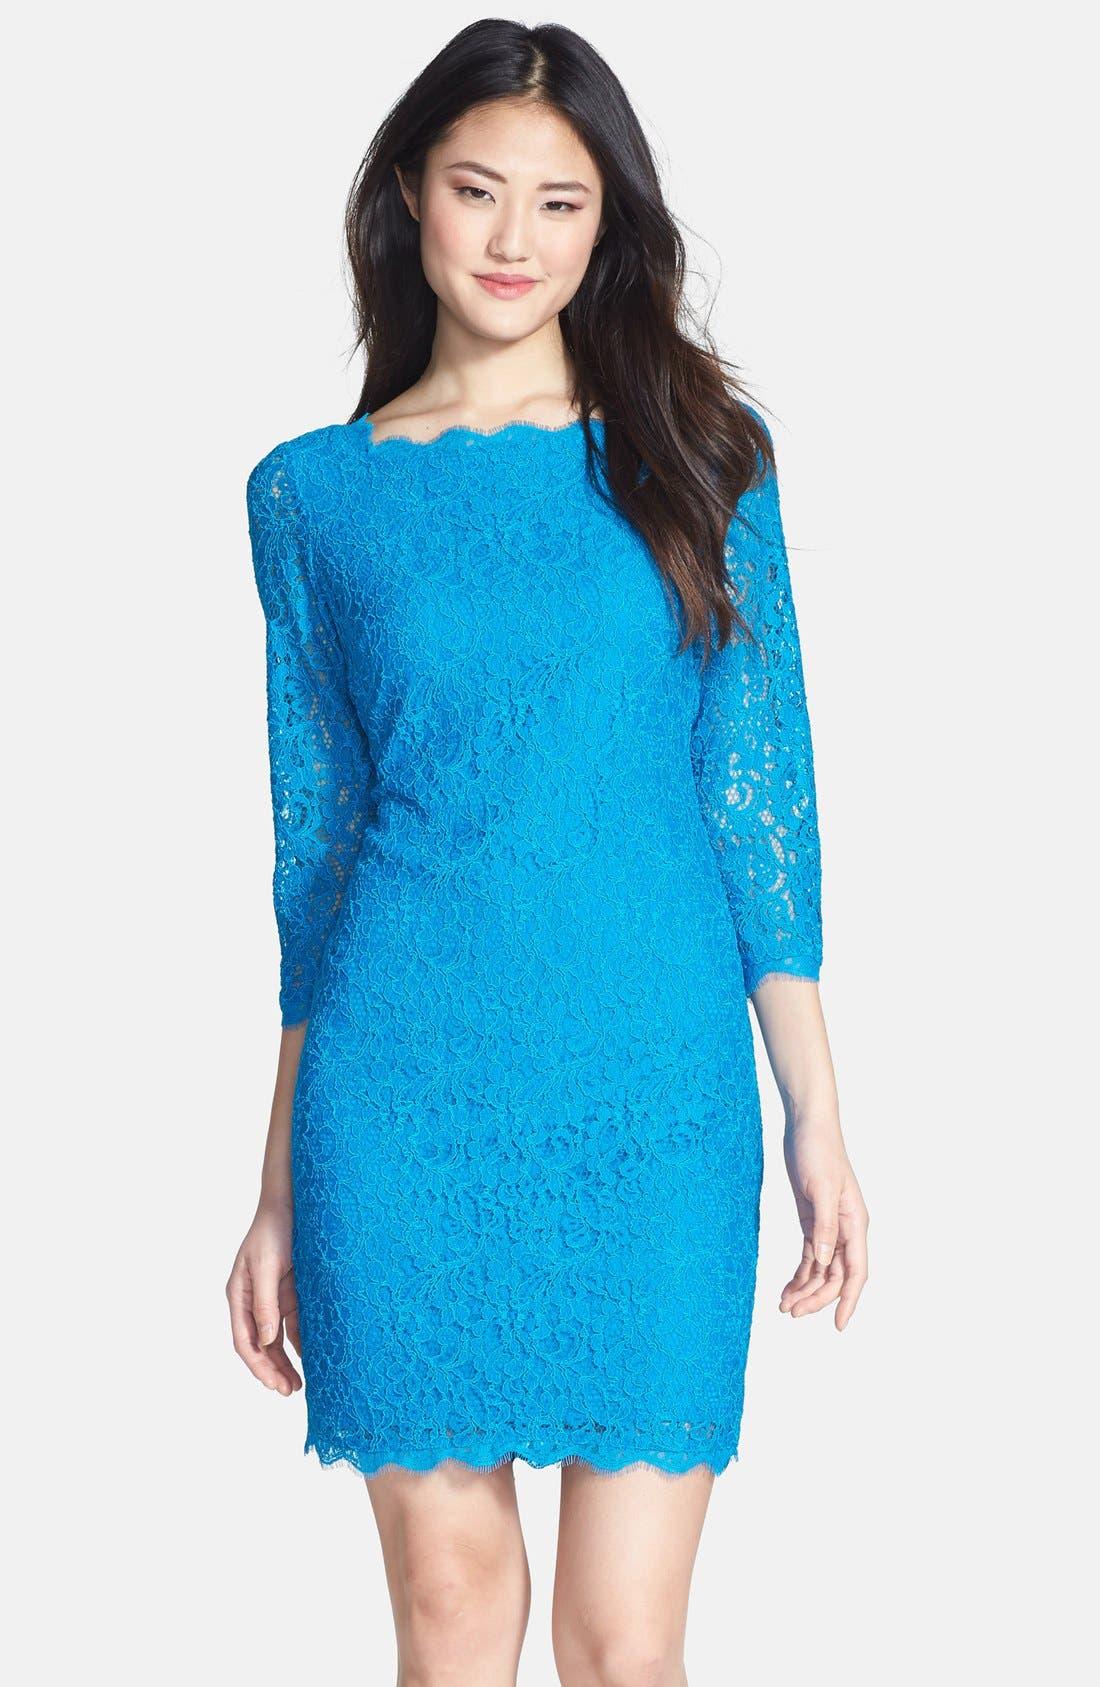 Alternate Image 1 Selected - Adrianna Papell Lace Overlay Sheath Dress (Regular & Petite)